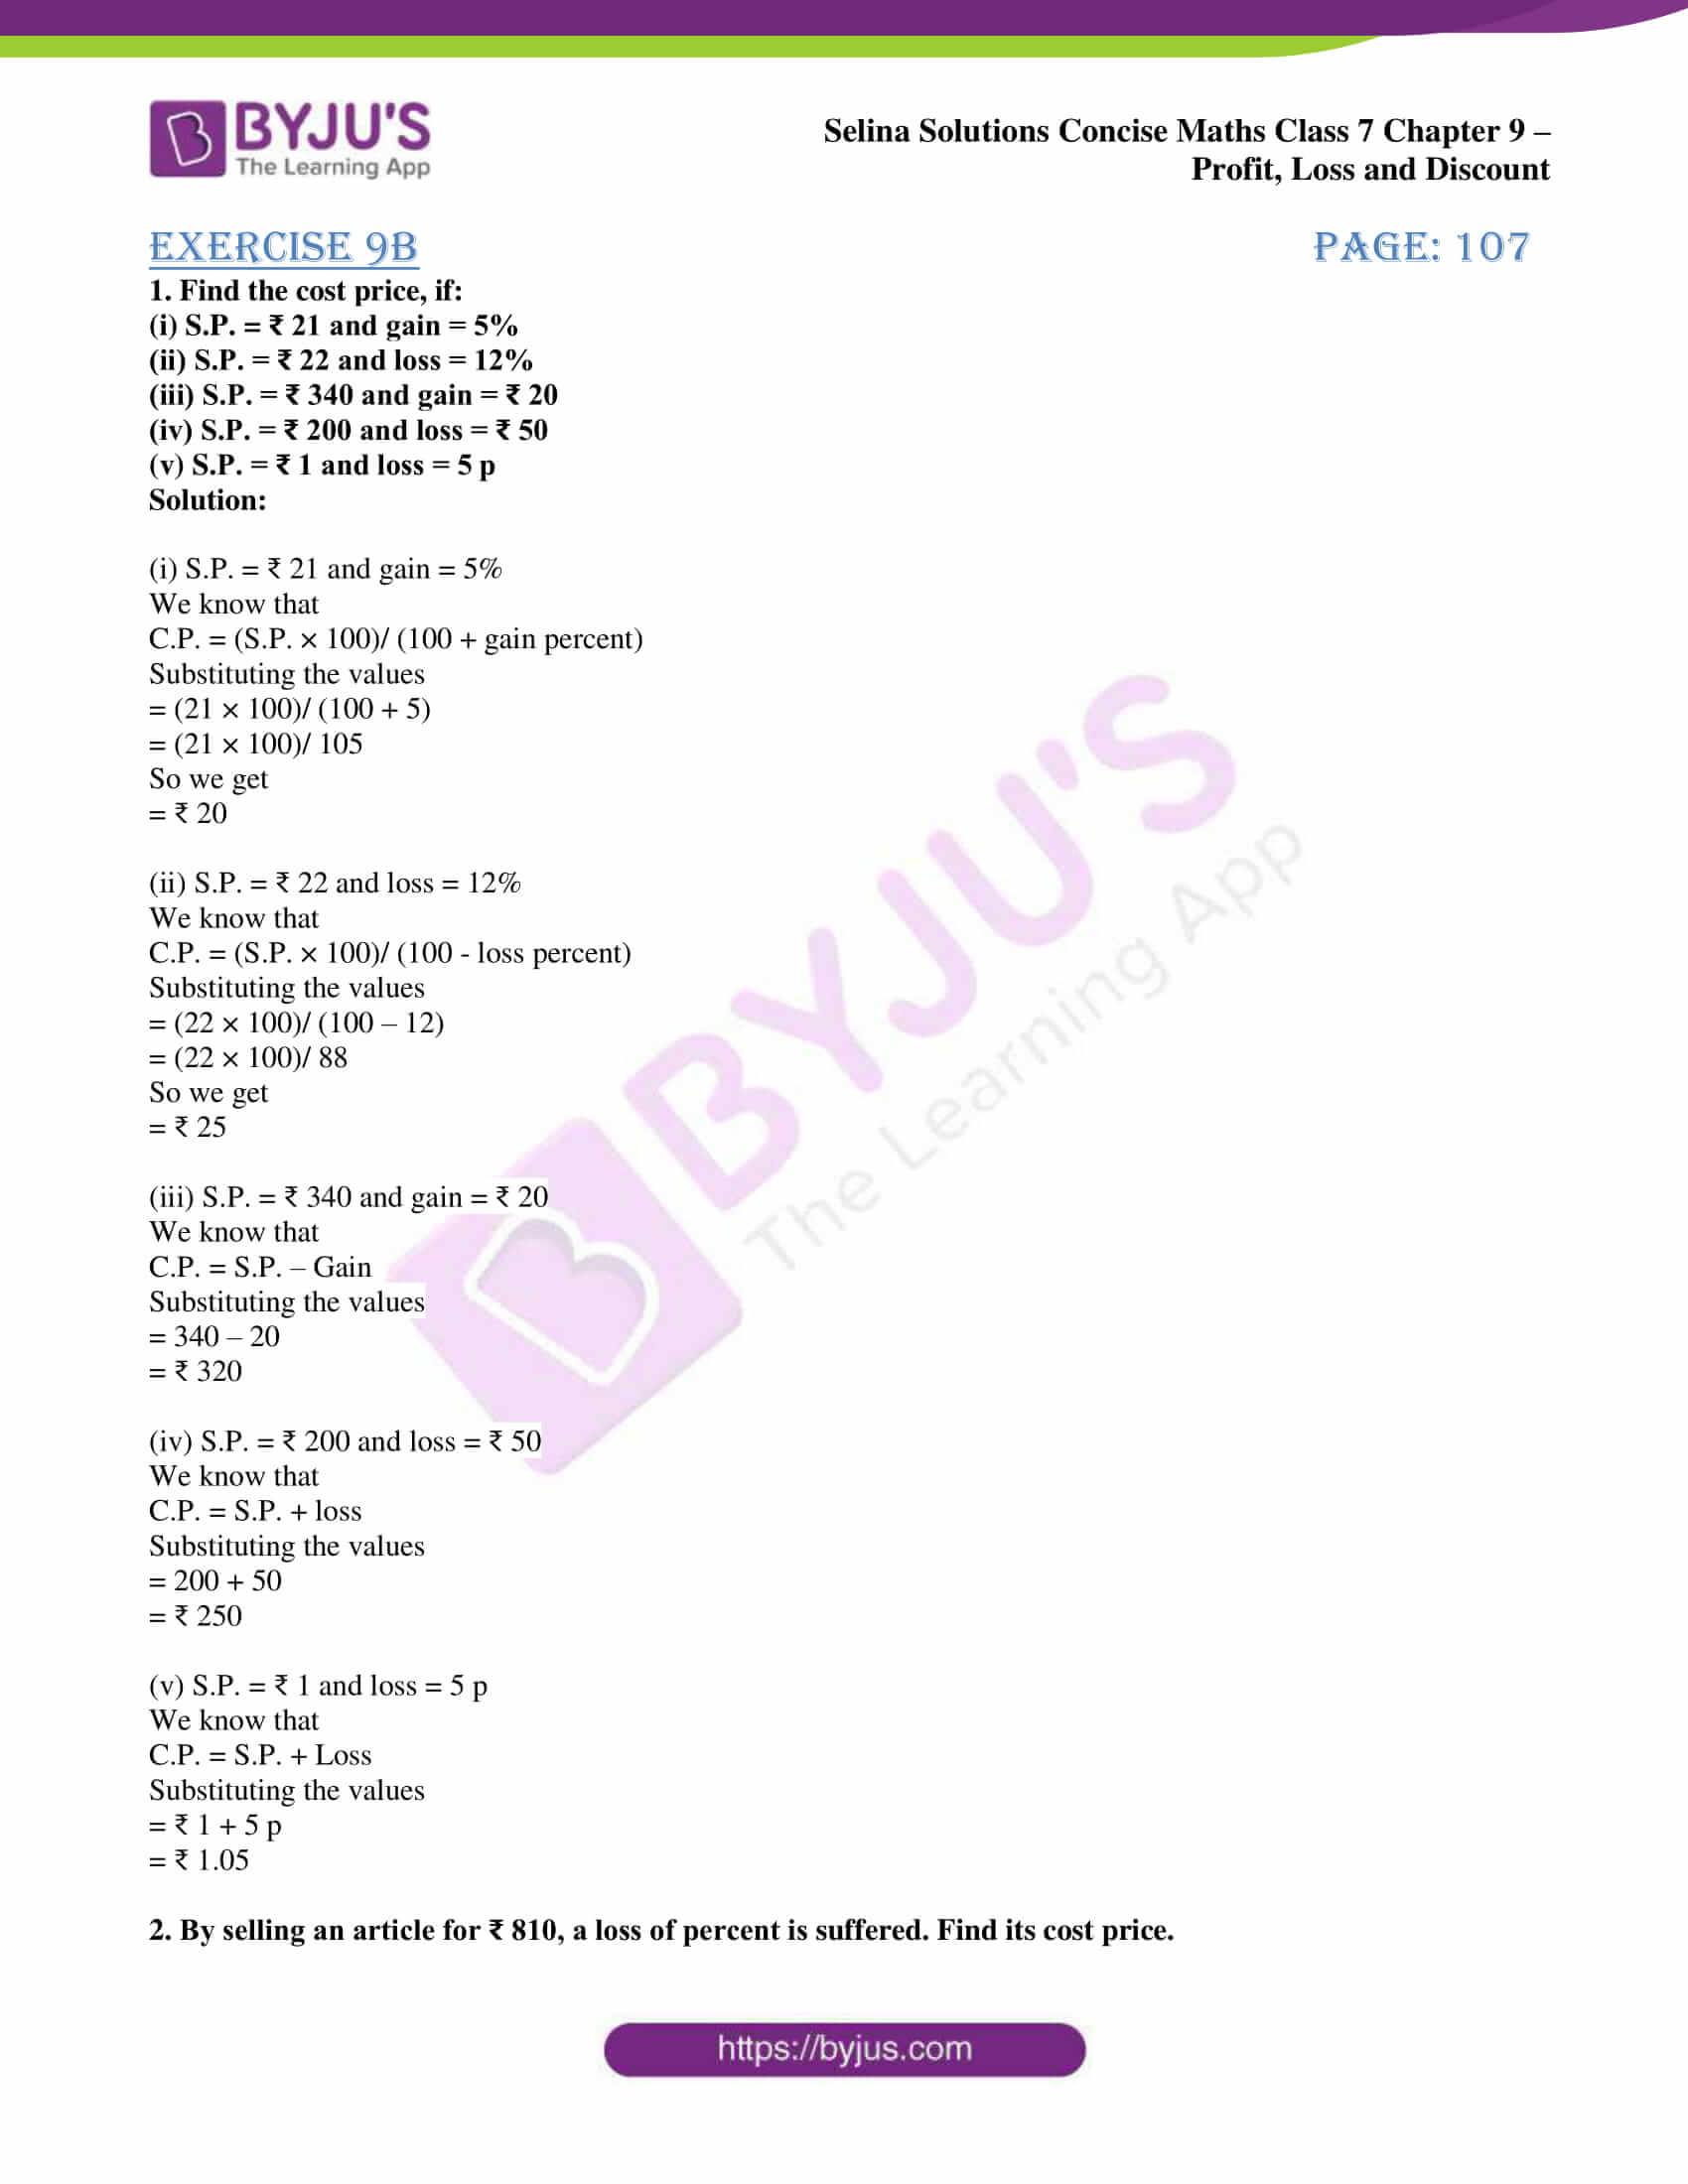 selina sol concise maths class 7 ch9 ex 9b 1